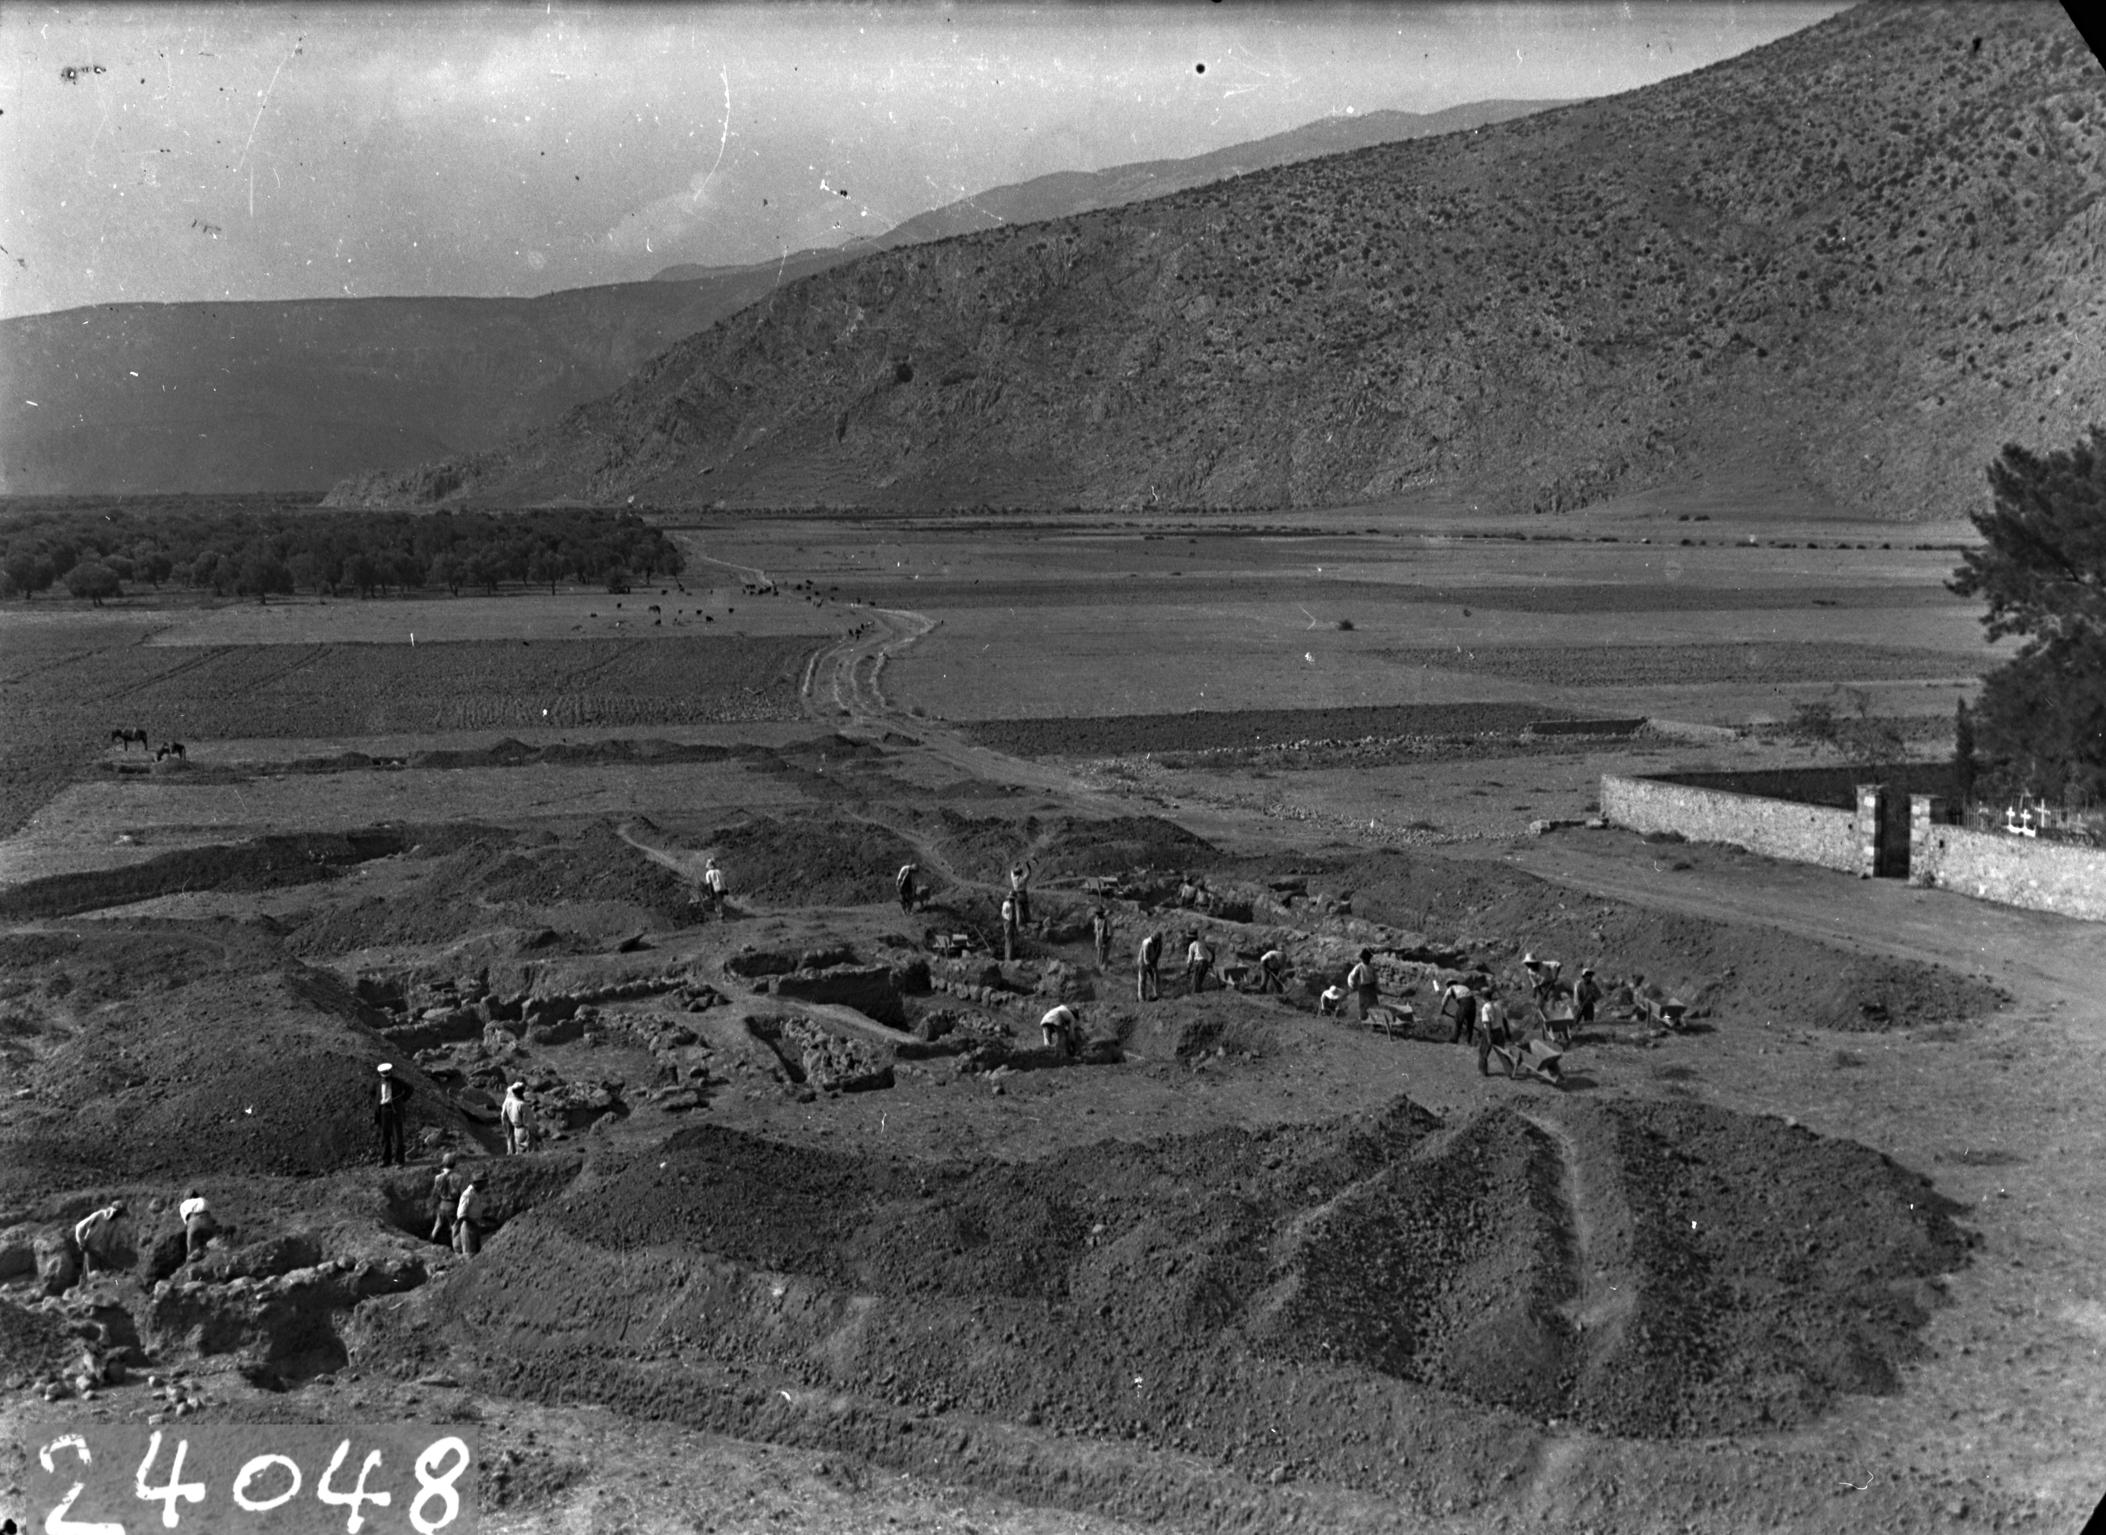 Campagne de fouilles en 1938